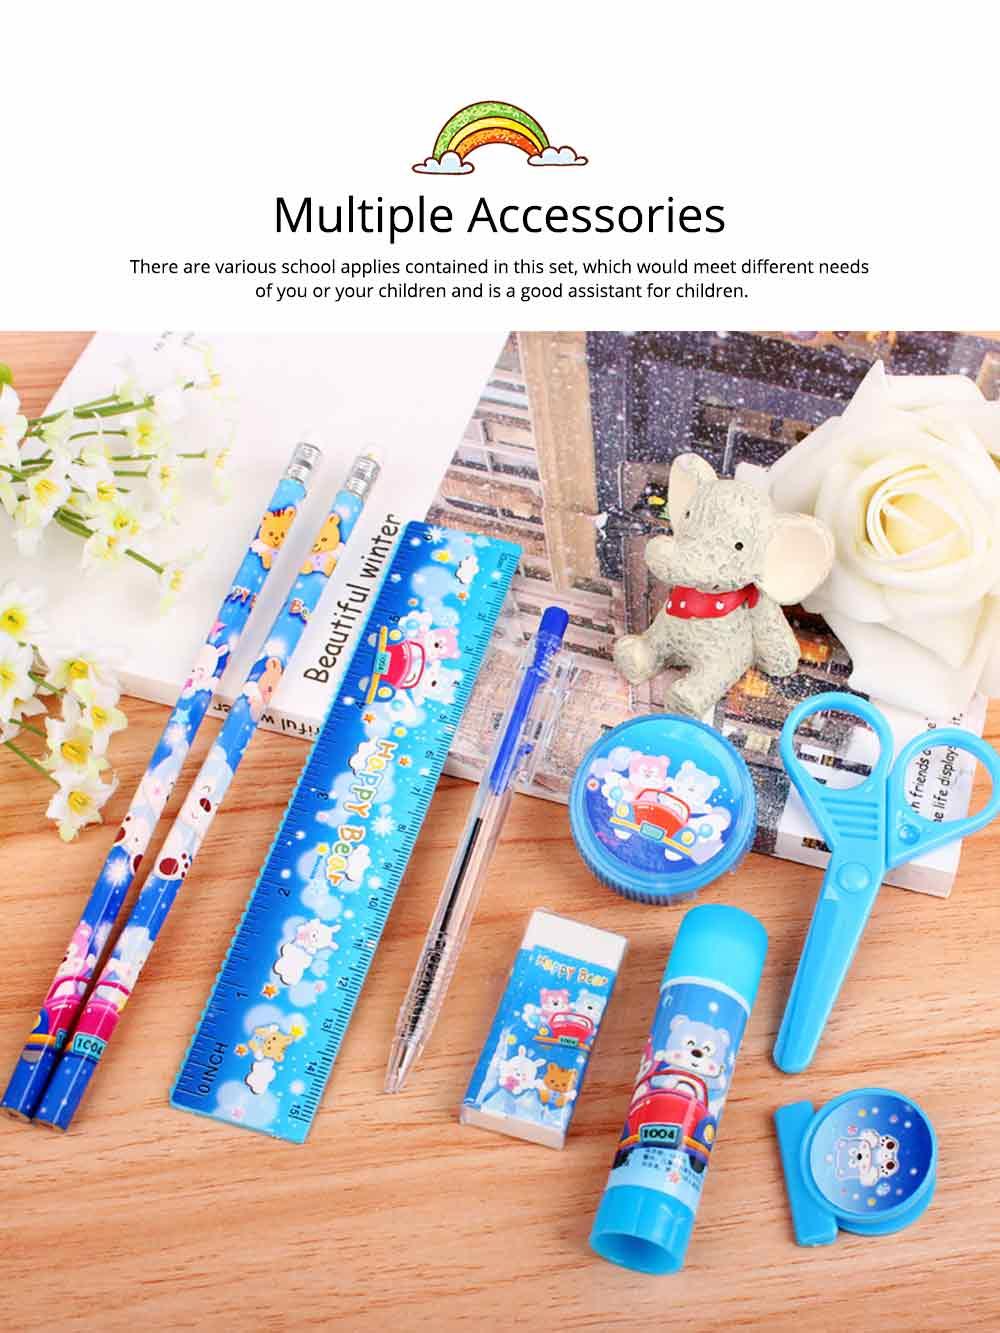 Functional 9 PCS Pencil Sharpener Rubber Scissors Glue Stick Clip Stationery Suit, Useful Stylish Children Study Accessories School Supplies 3